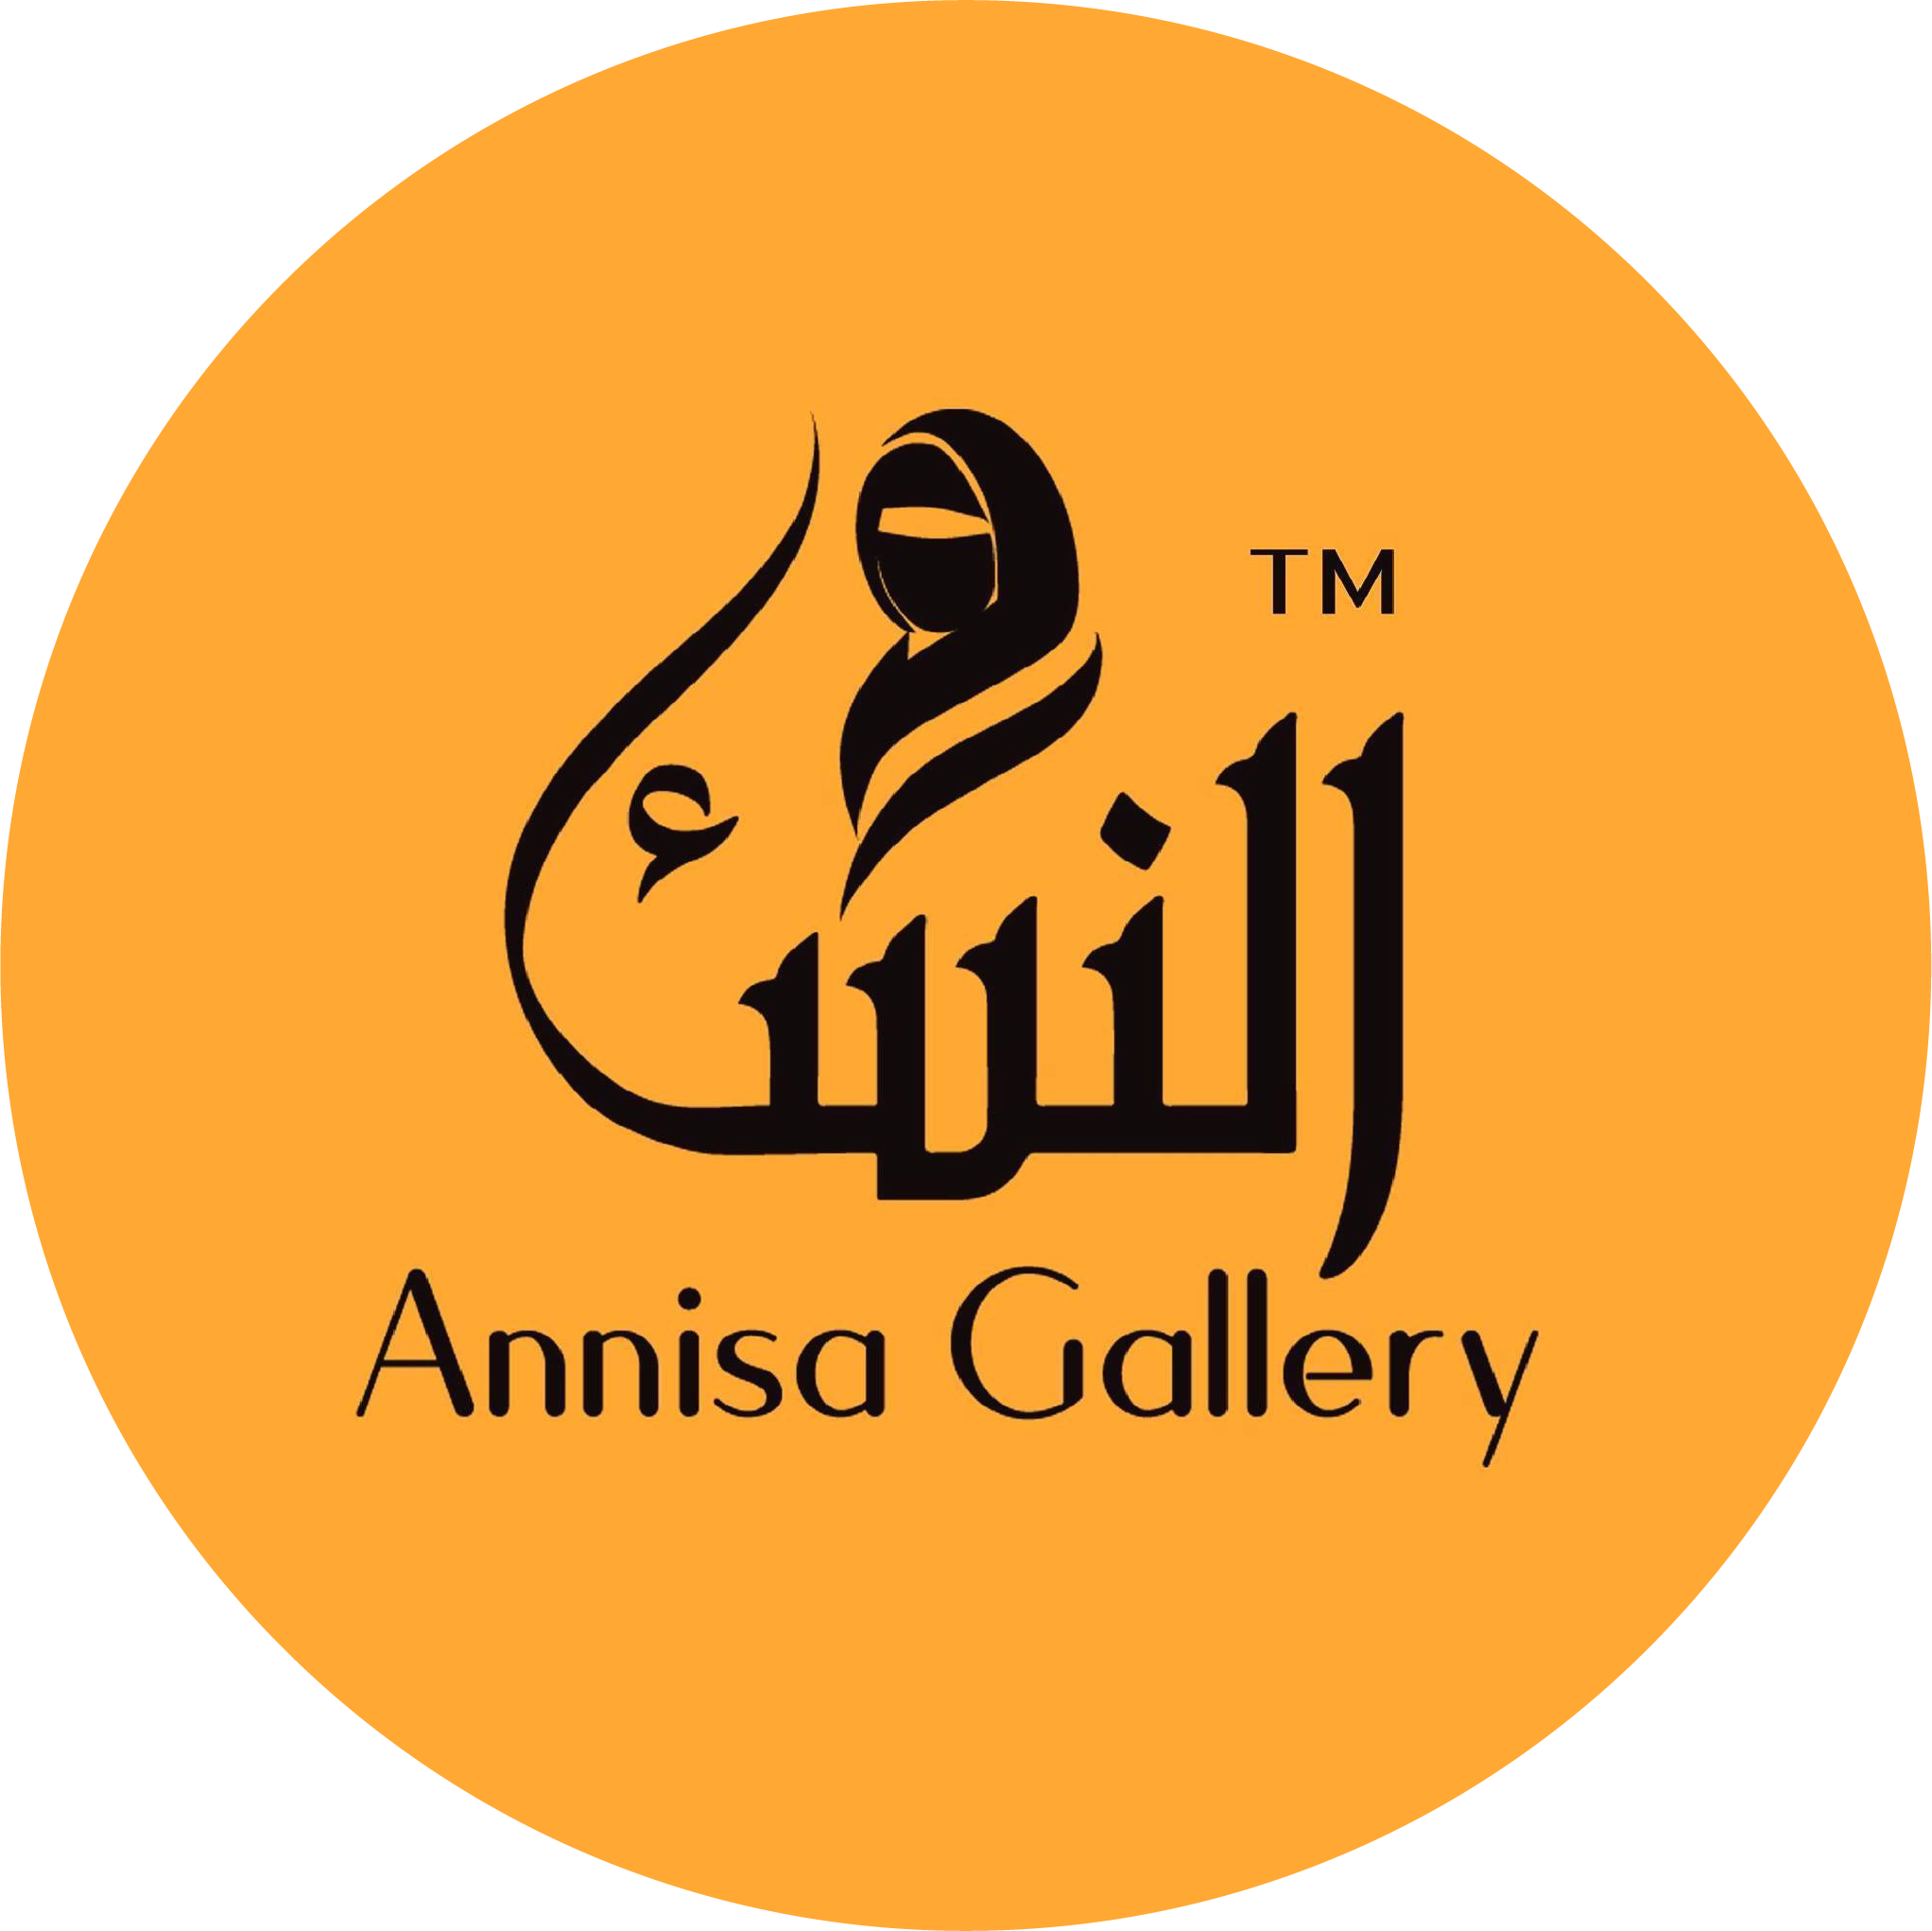 Annisa Gallery